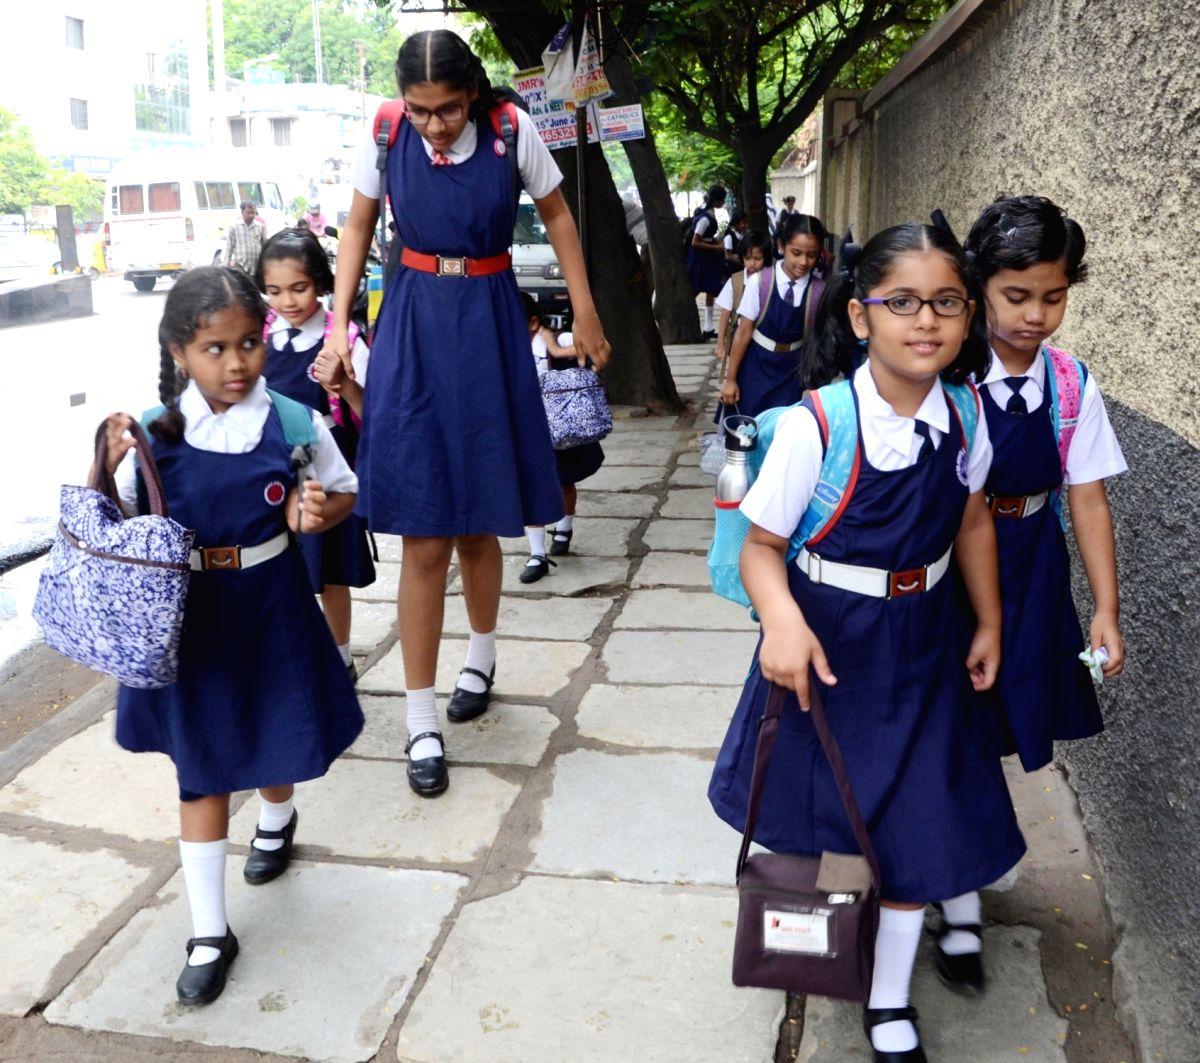 Hyderabad: Schools re-open after summer vacations in Hyderabad, on June 13, 2017.